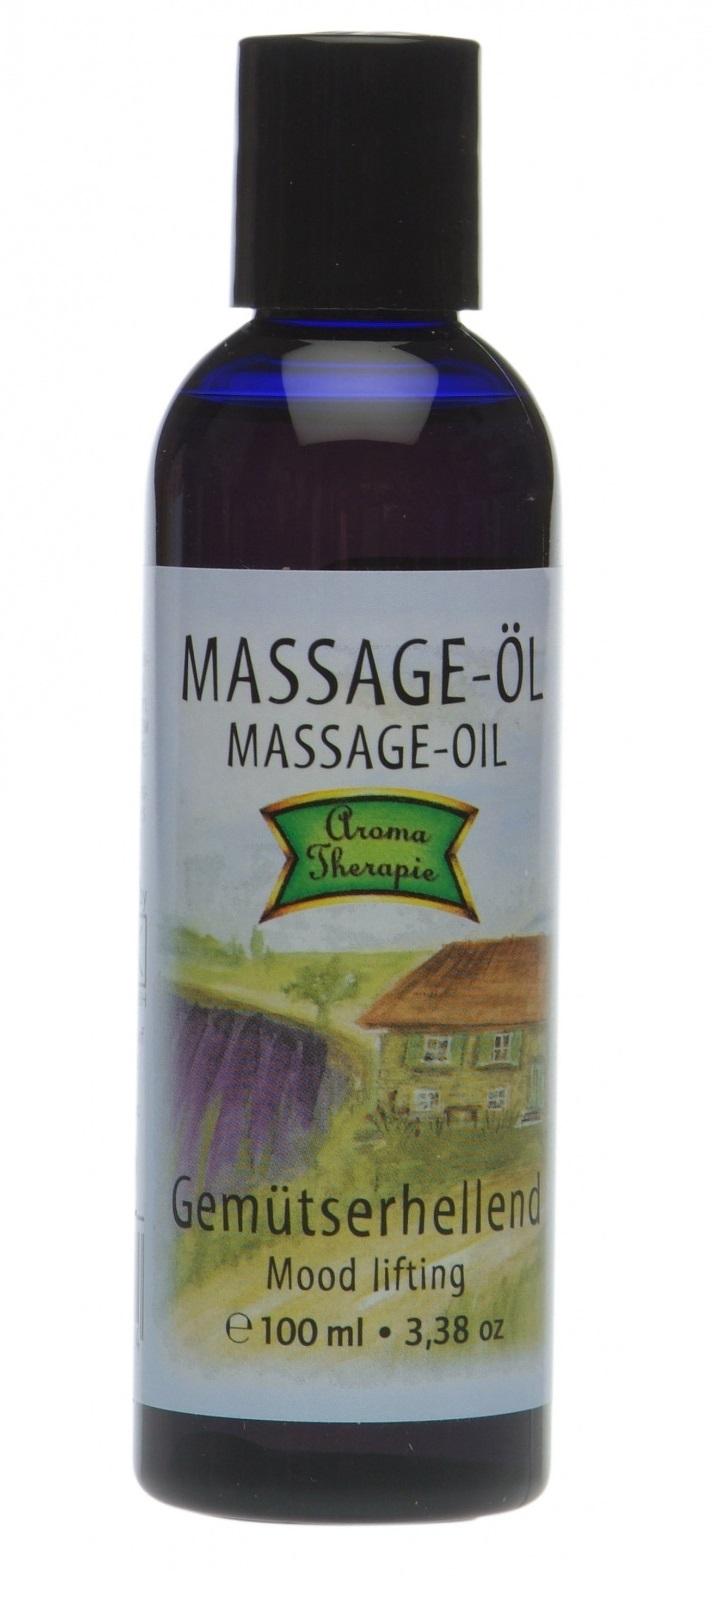 Styx Naturkosmetik - Aroma Derm - Massage